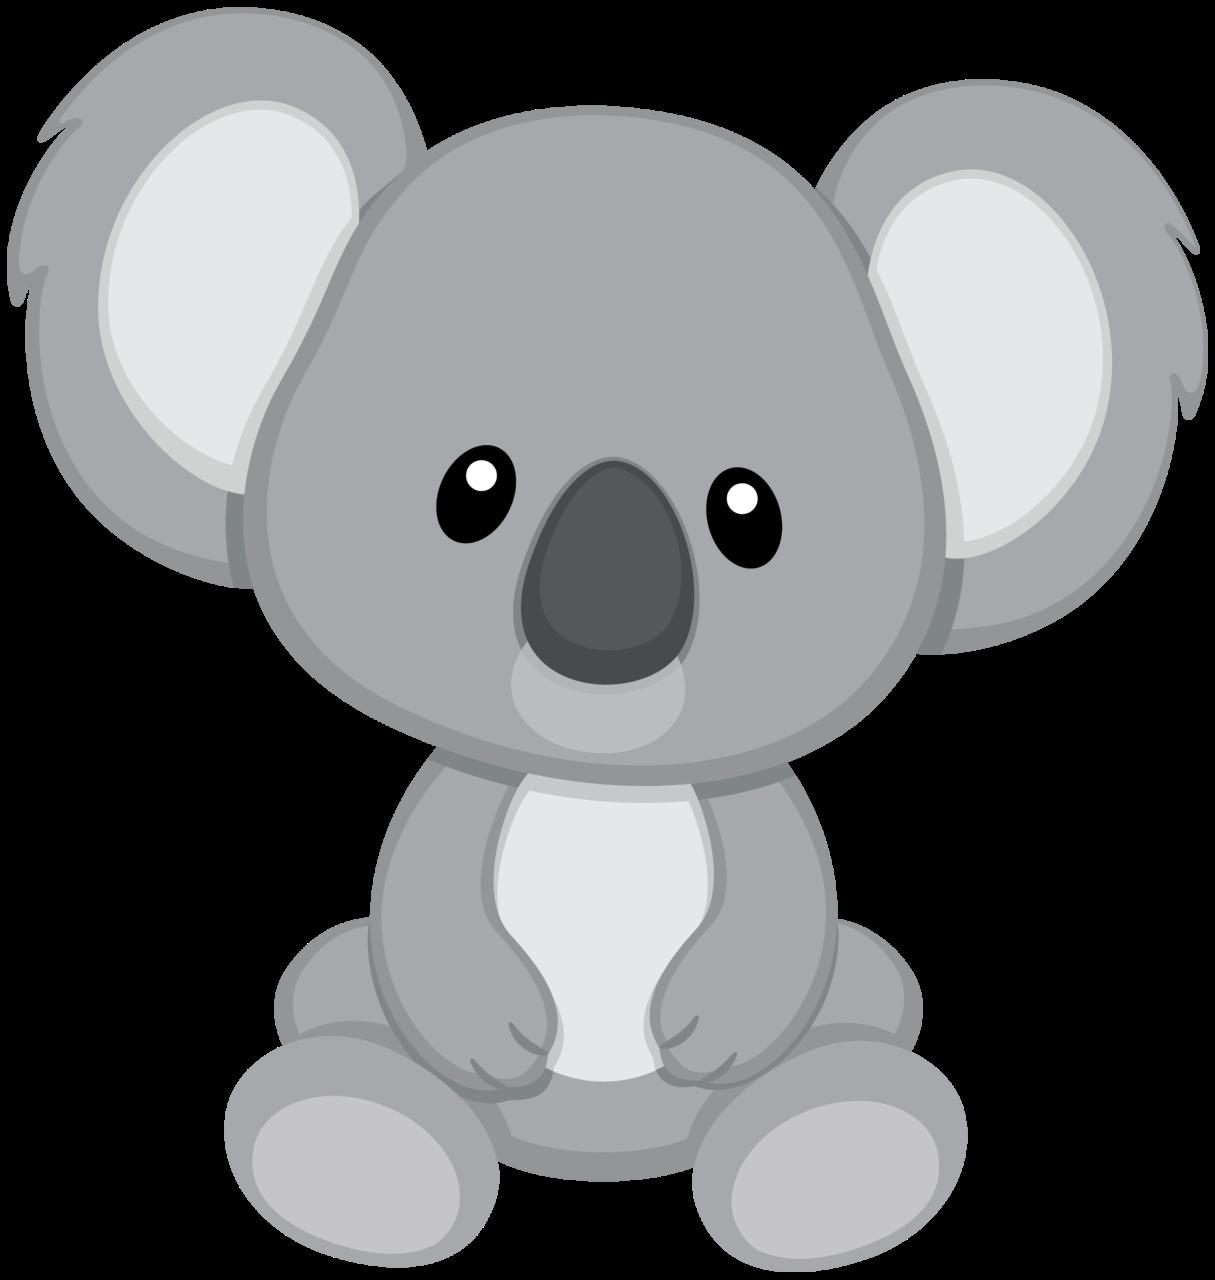 0_103df5_327dc506_orig (1215×1280). Koala CraftKoala BearsBaby PlusPng pluspng.com  - Baby Koala - Koala PNG HD